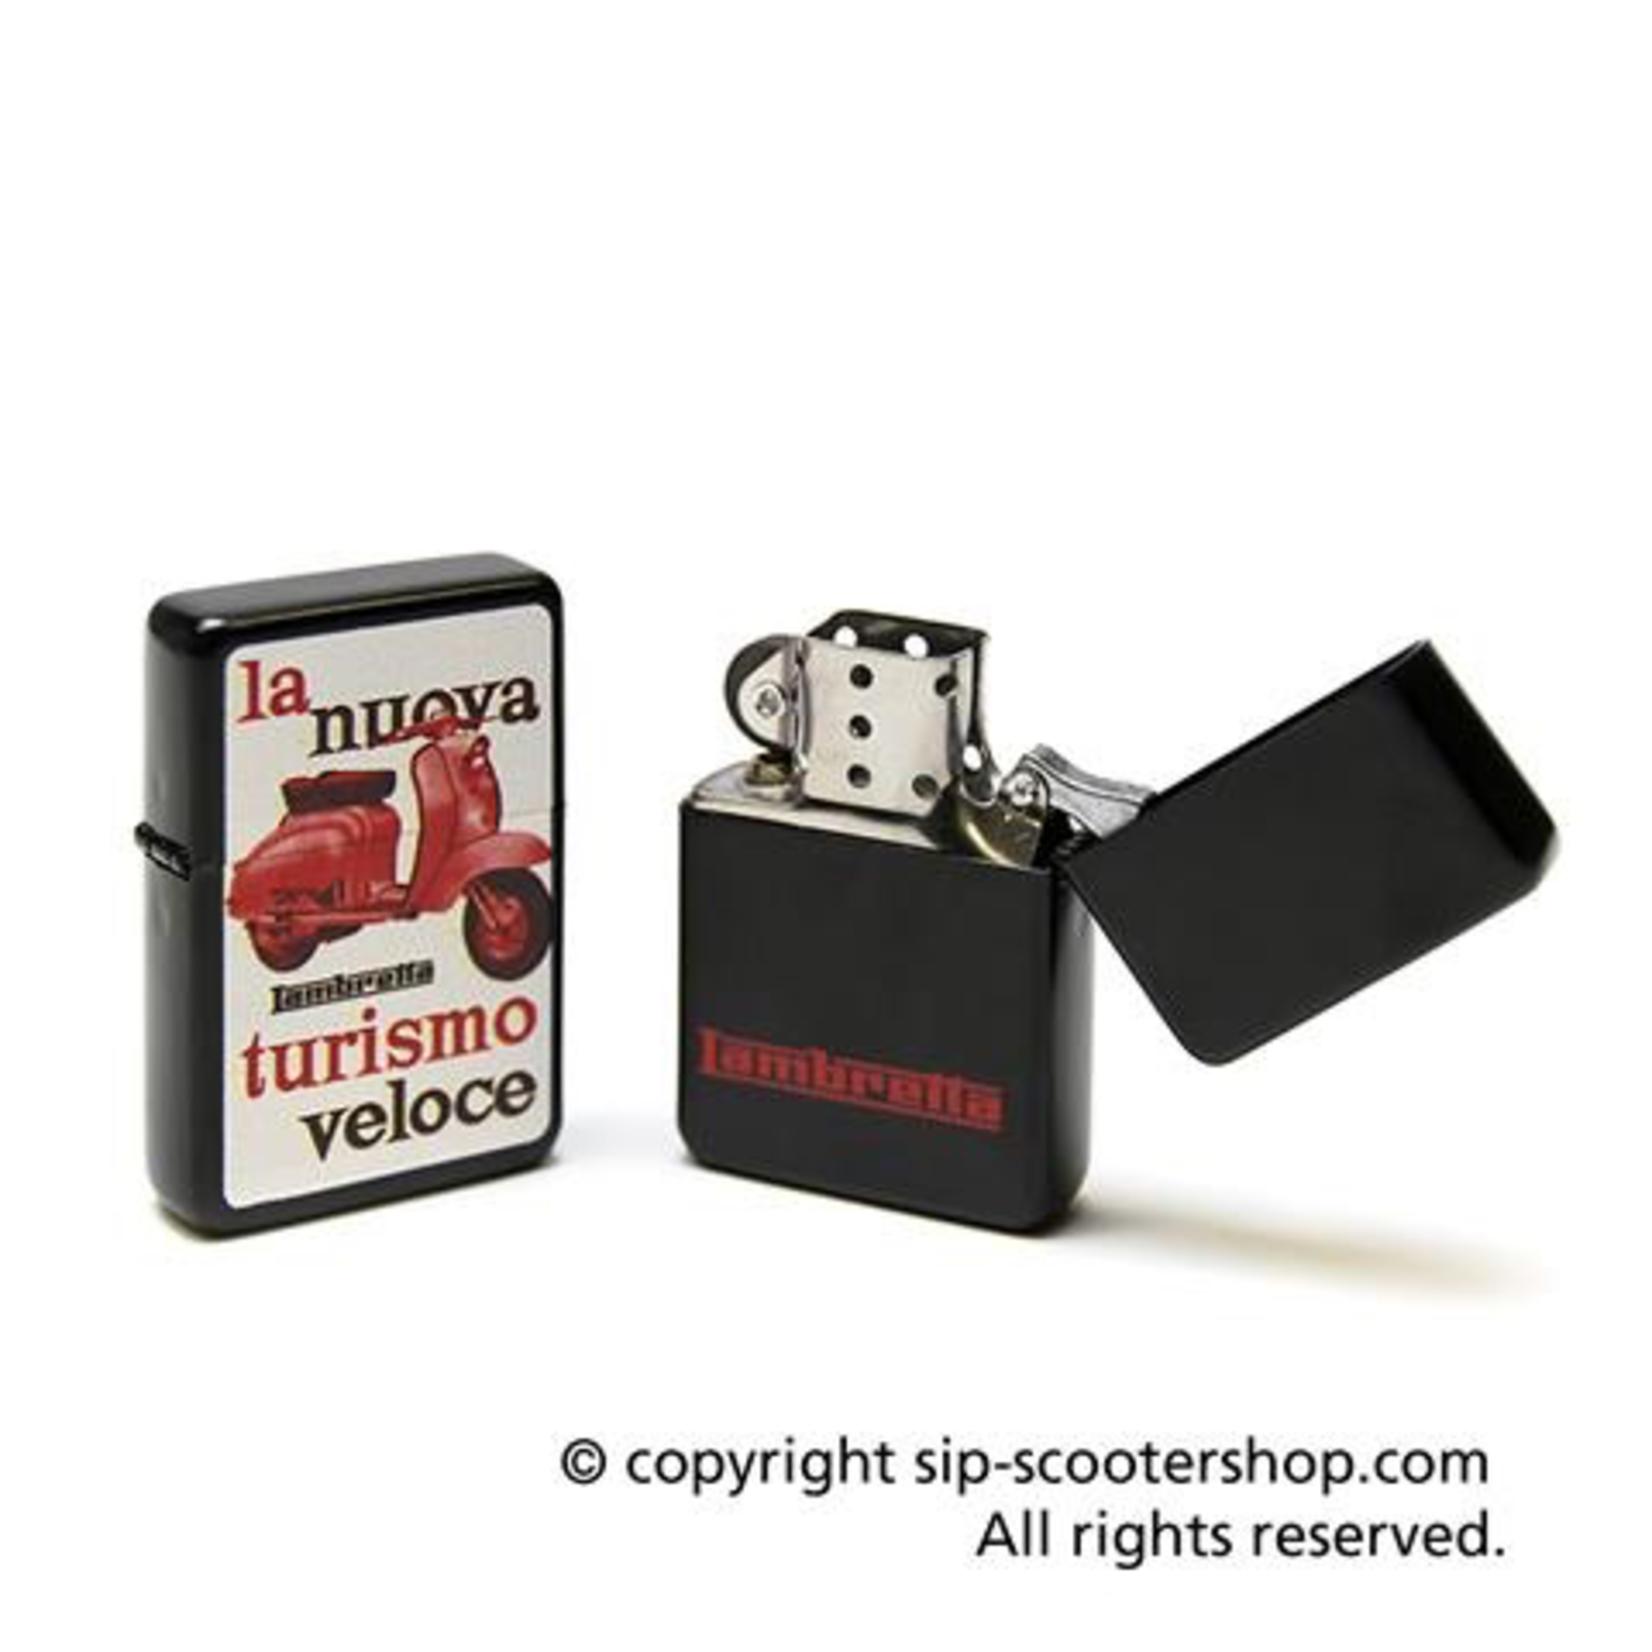 Lifestyle Lighter, Lambretta (5 choices)